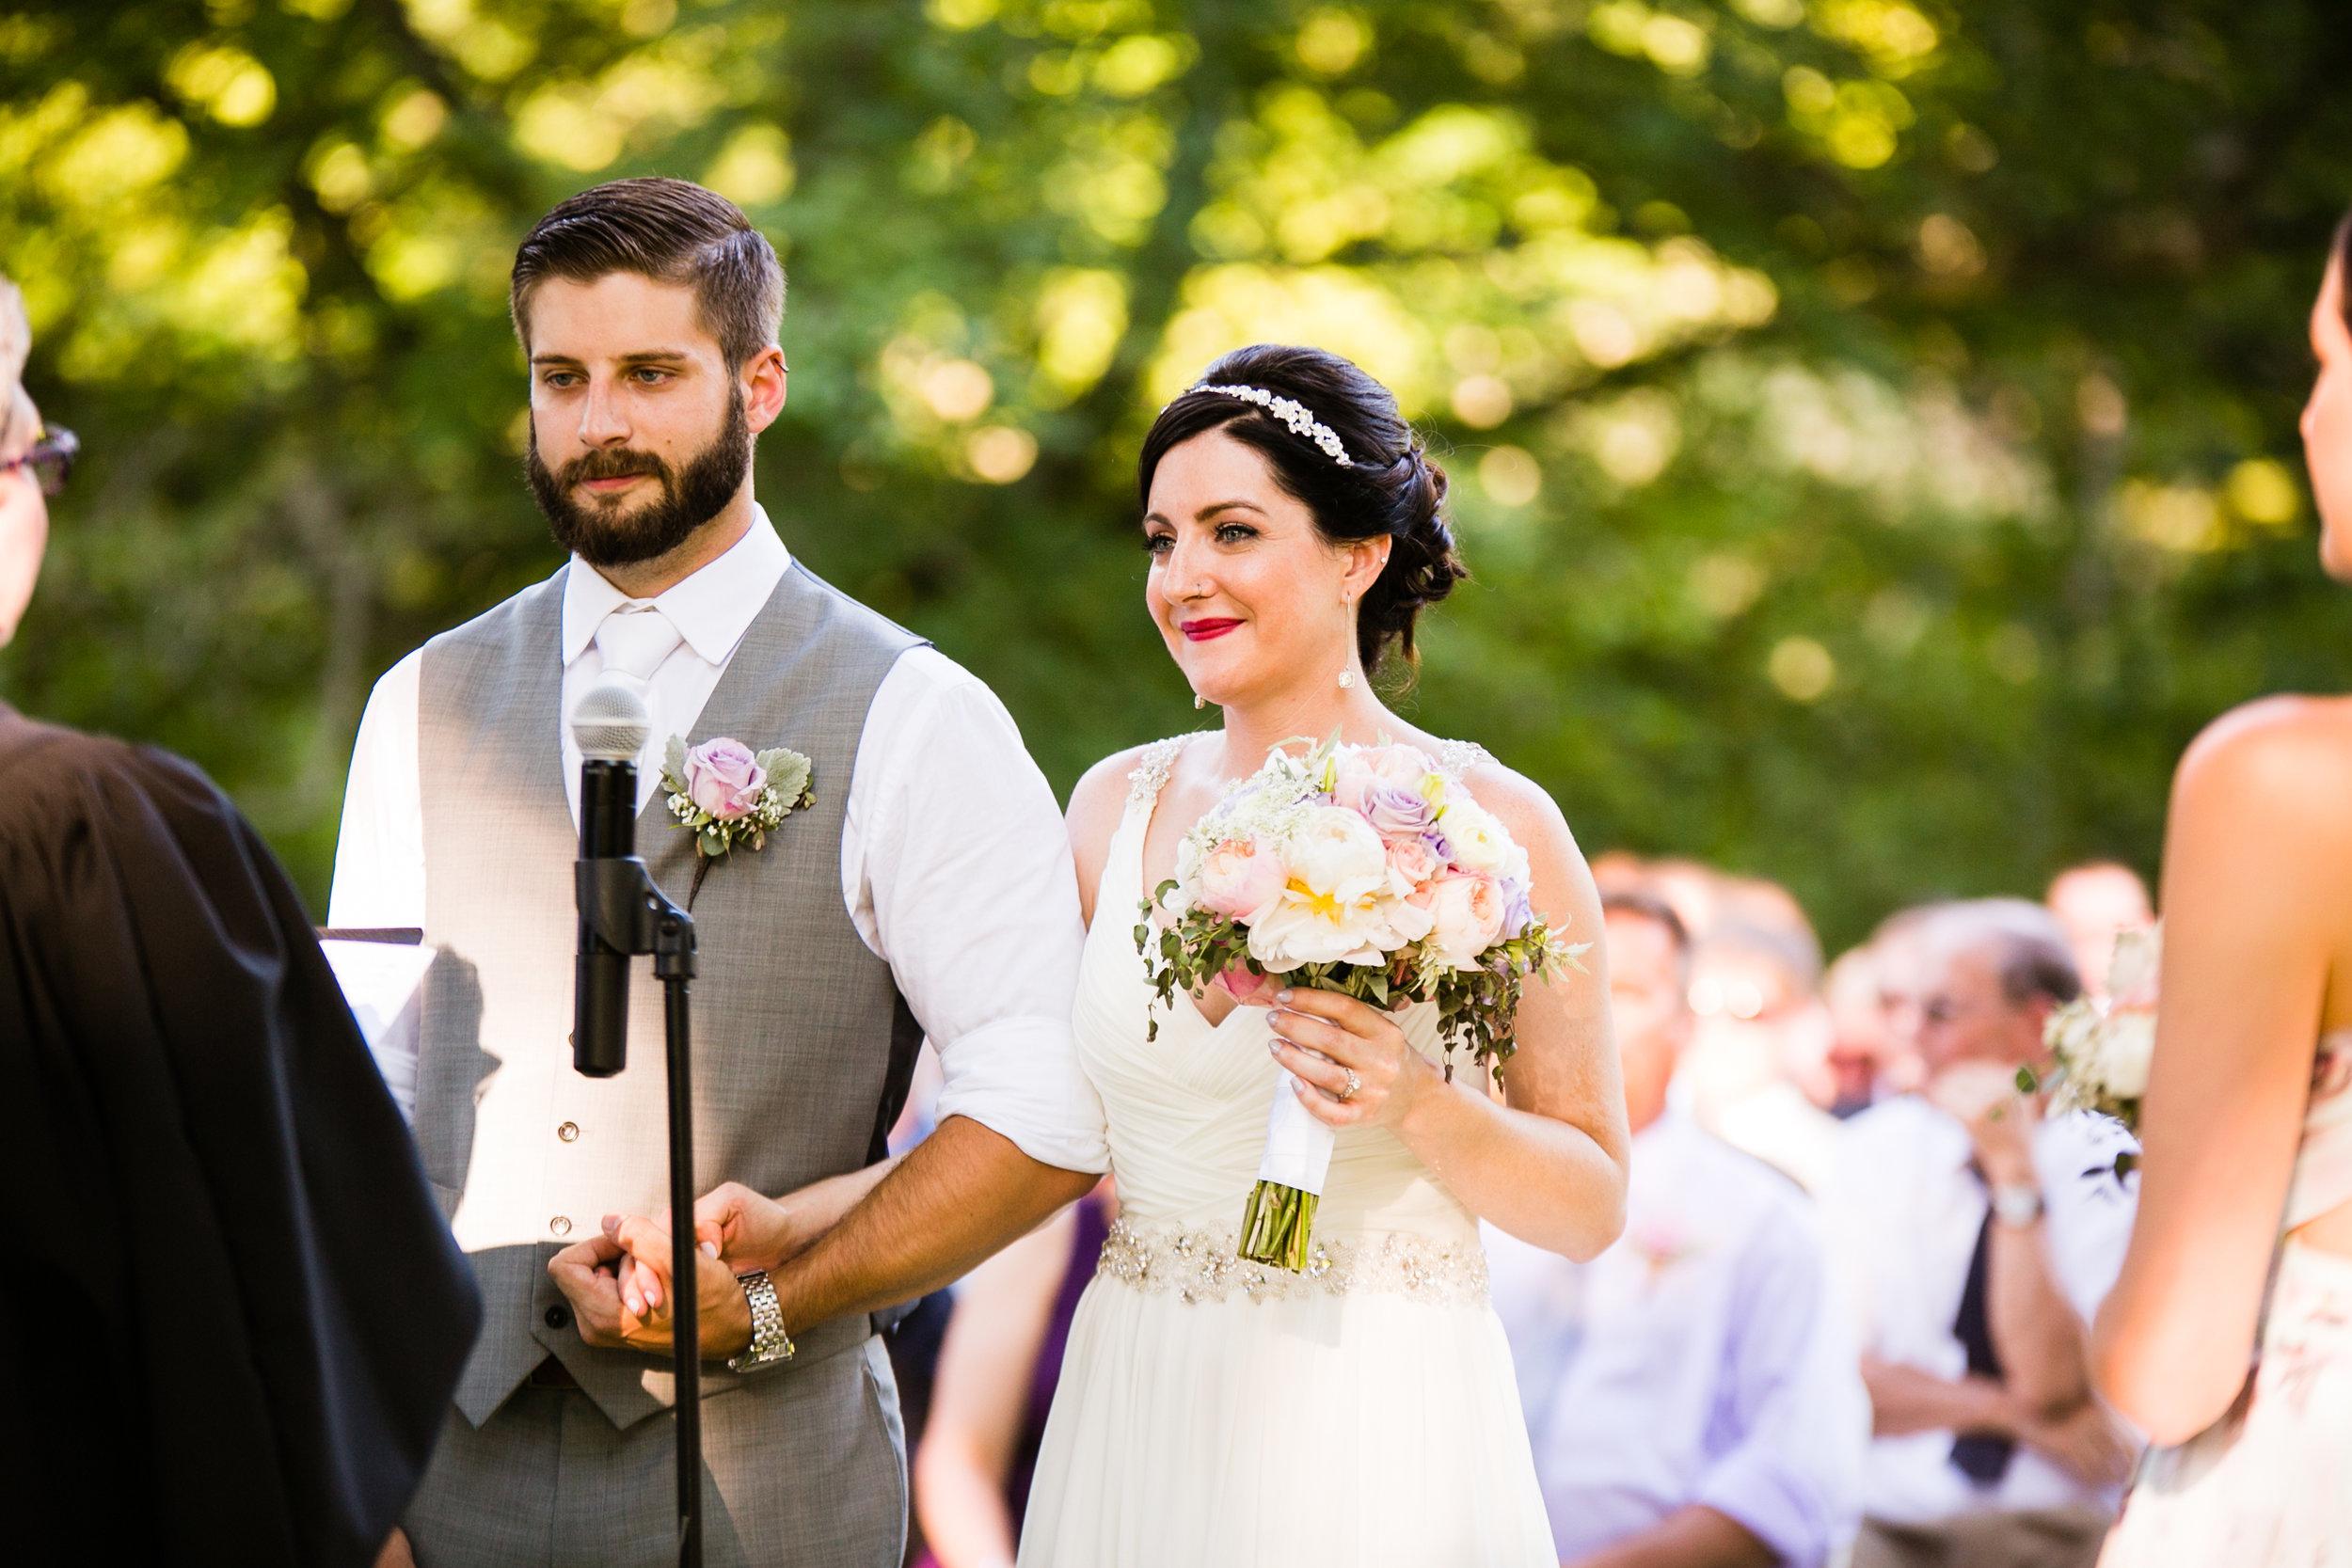 TYLER ARBORETUM WEDDING PHOTOGRAPHY LOVESTRUCK PICTURES-053.jpg